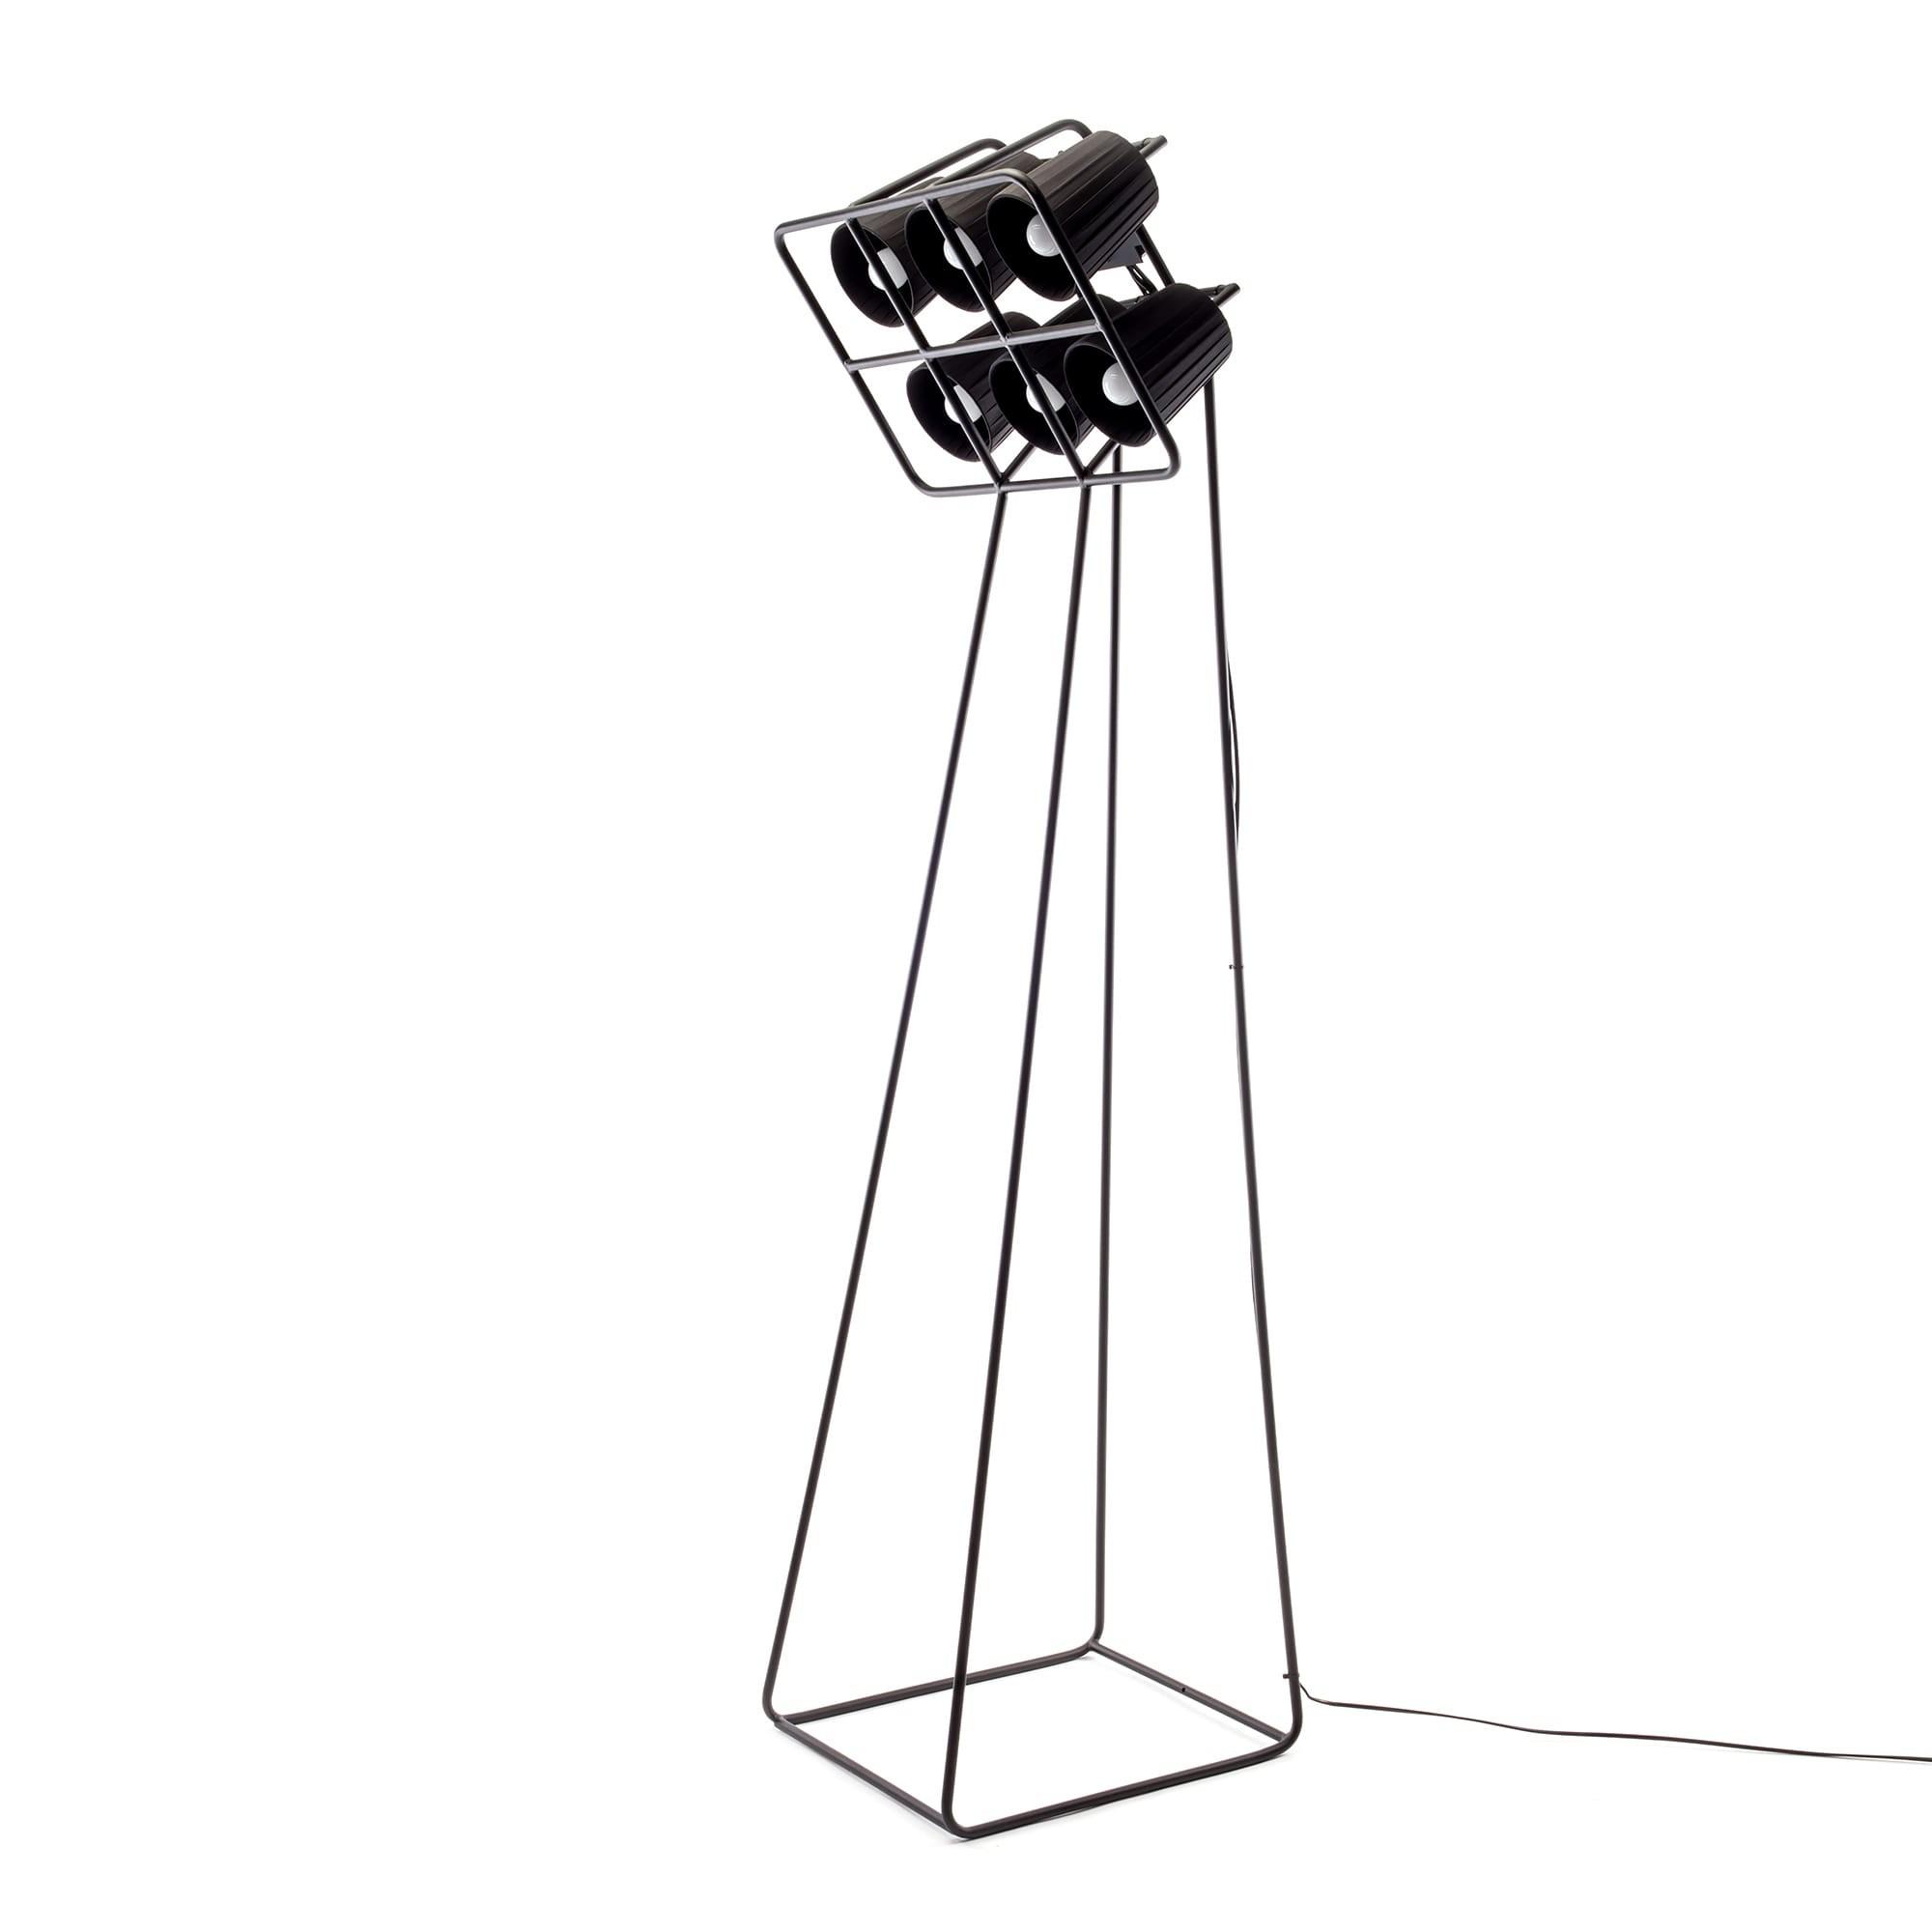 Multilamp Football Floor Lamp Seletti Design Is This